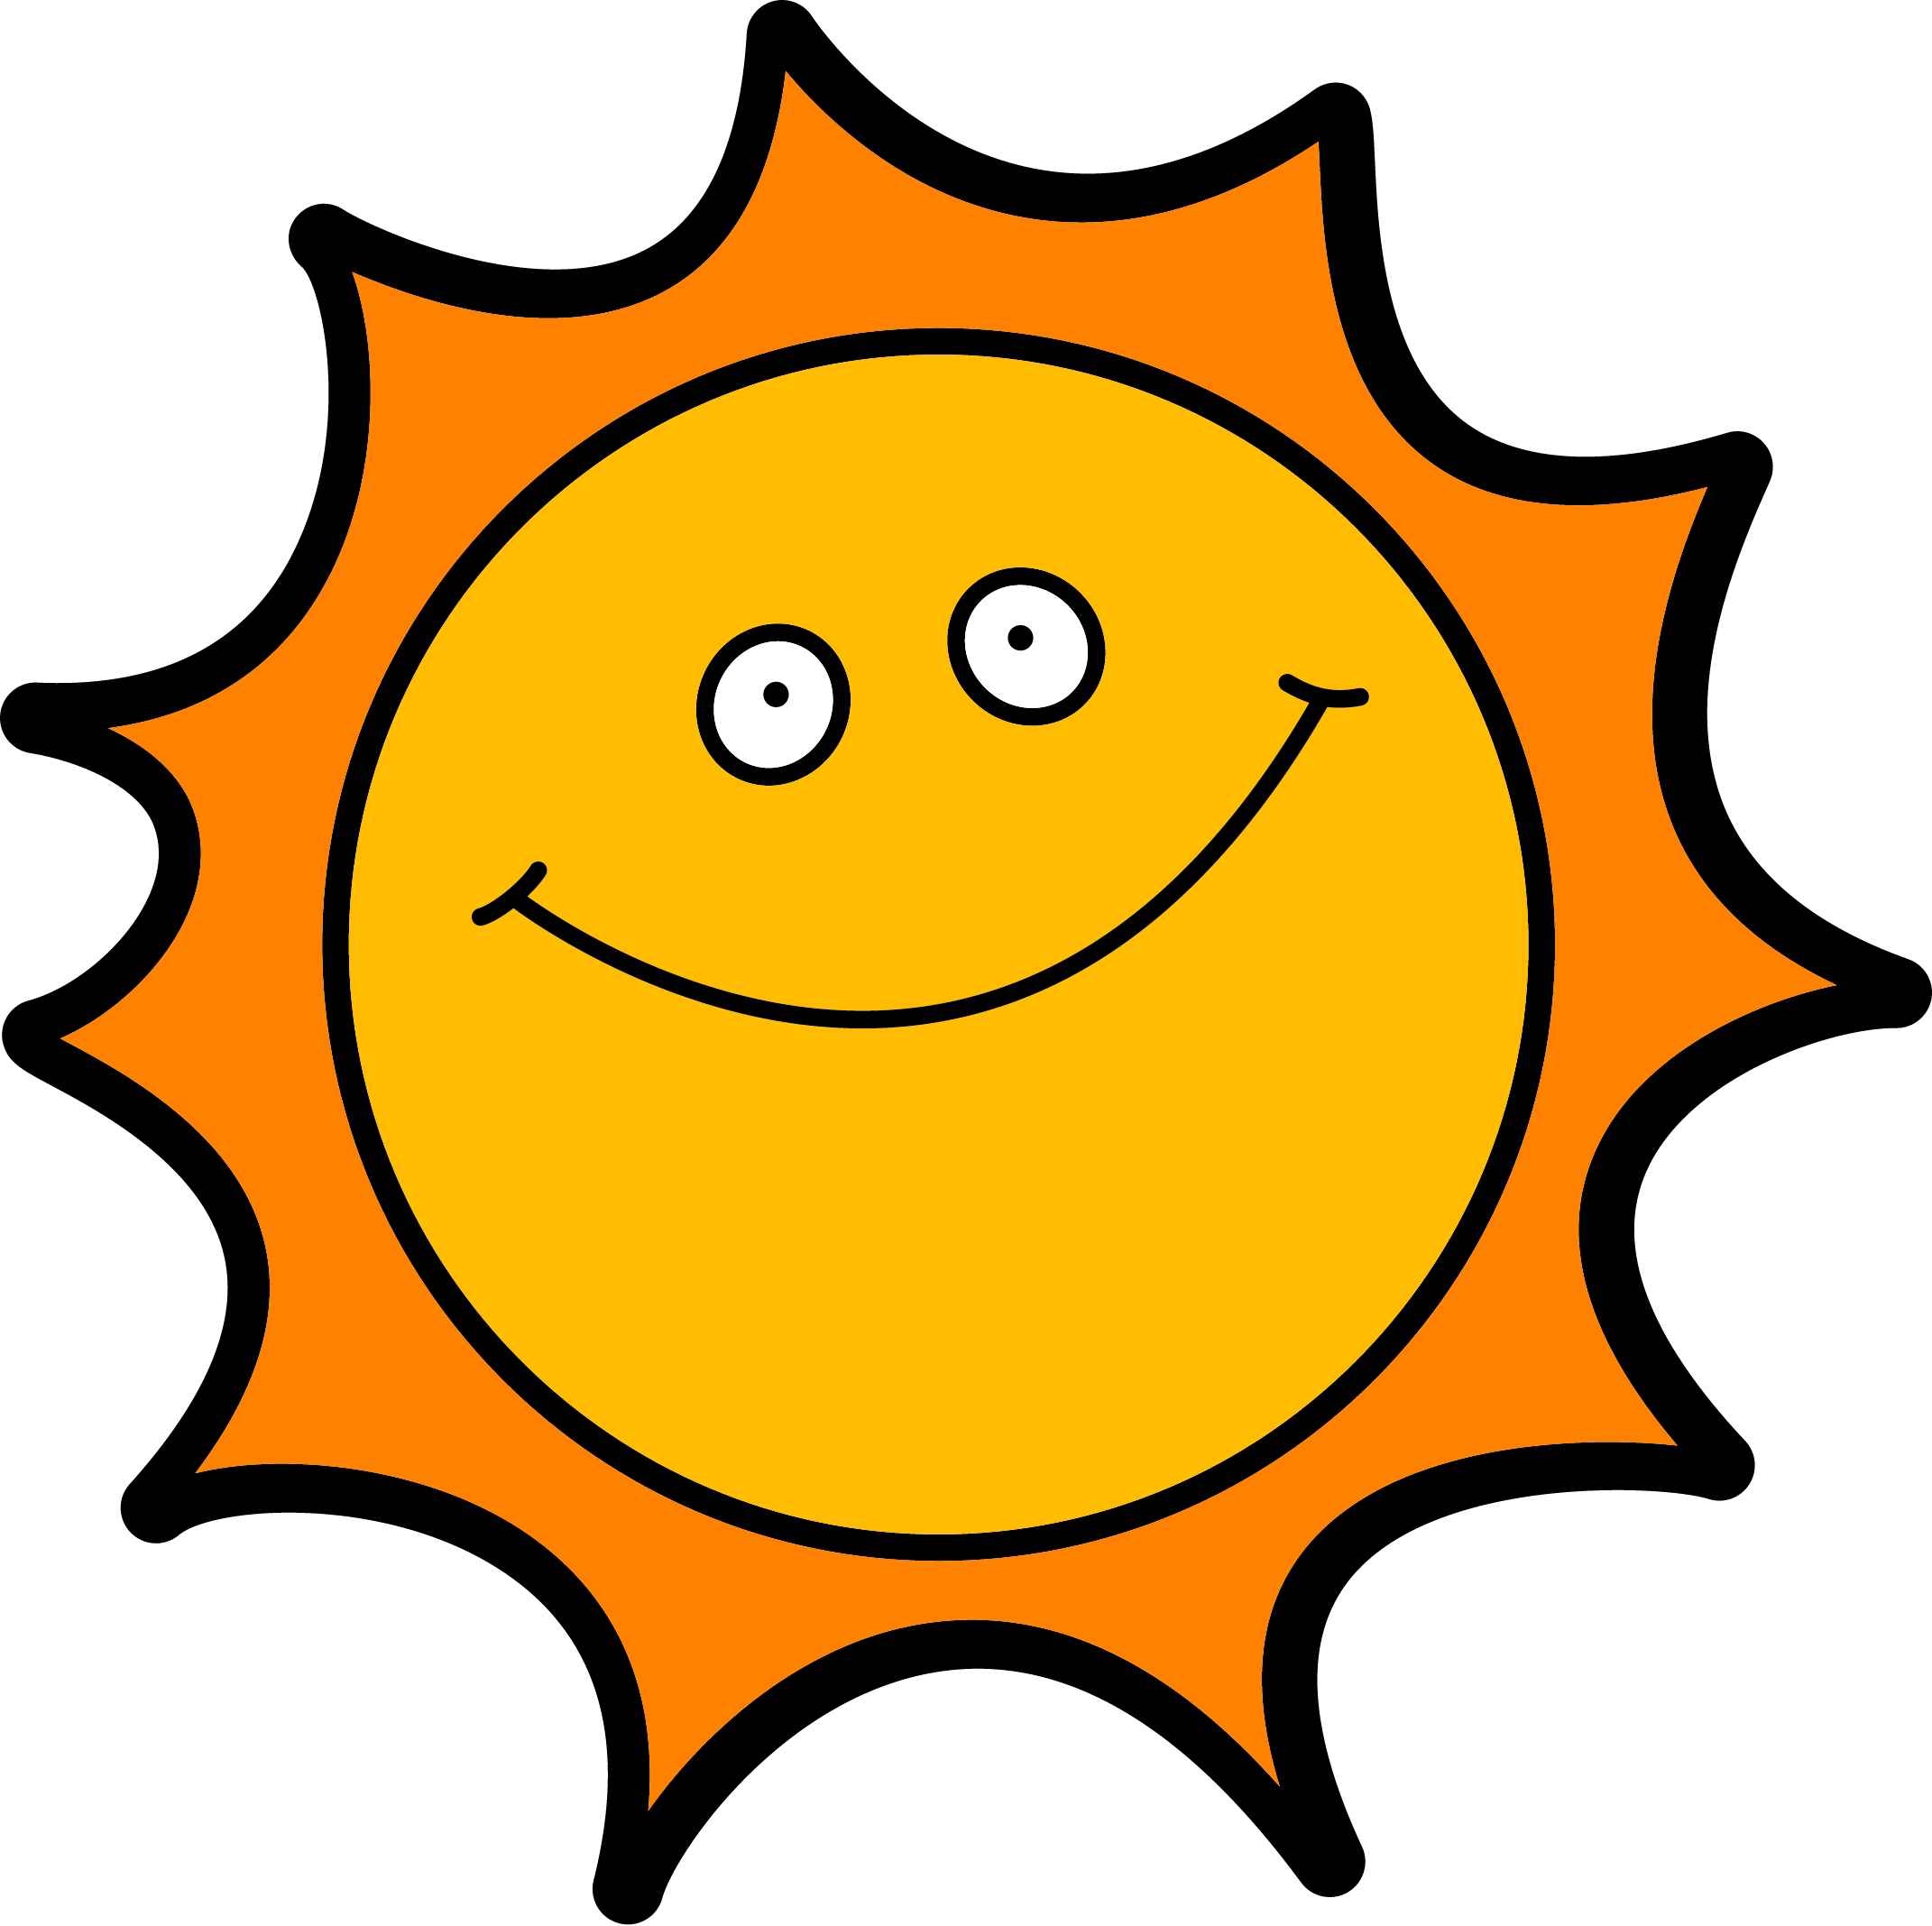 Free Microsoft Sun Cliparts, Download Free Clip Art, Free.